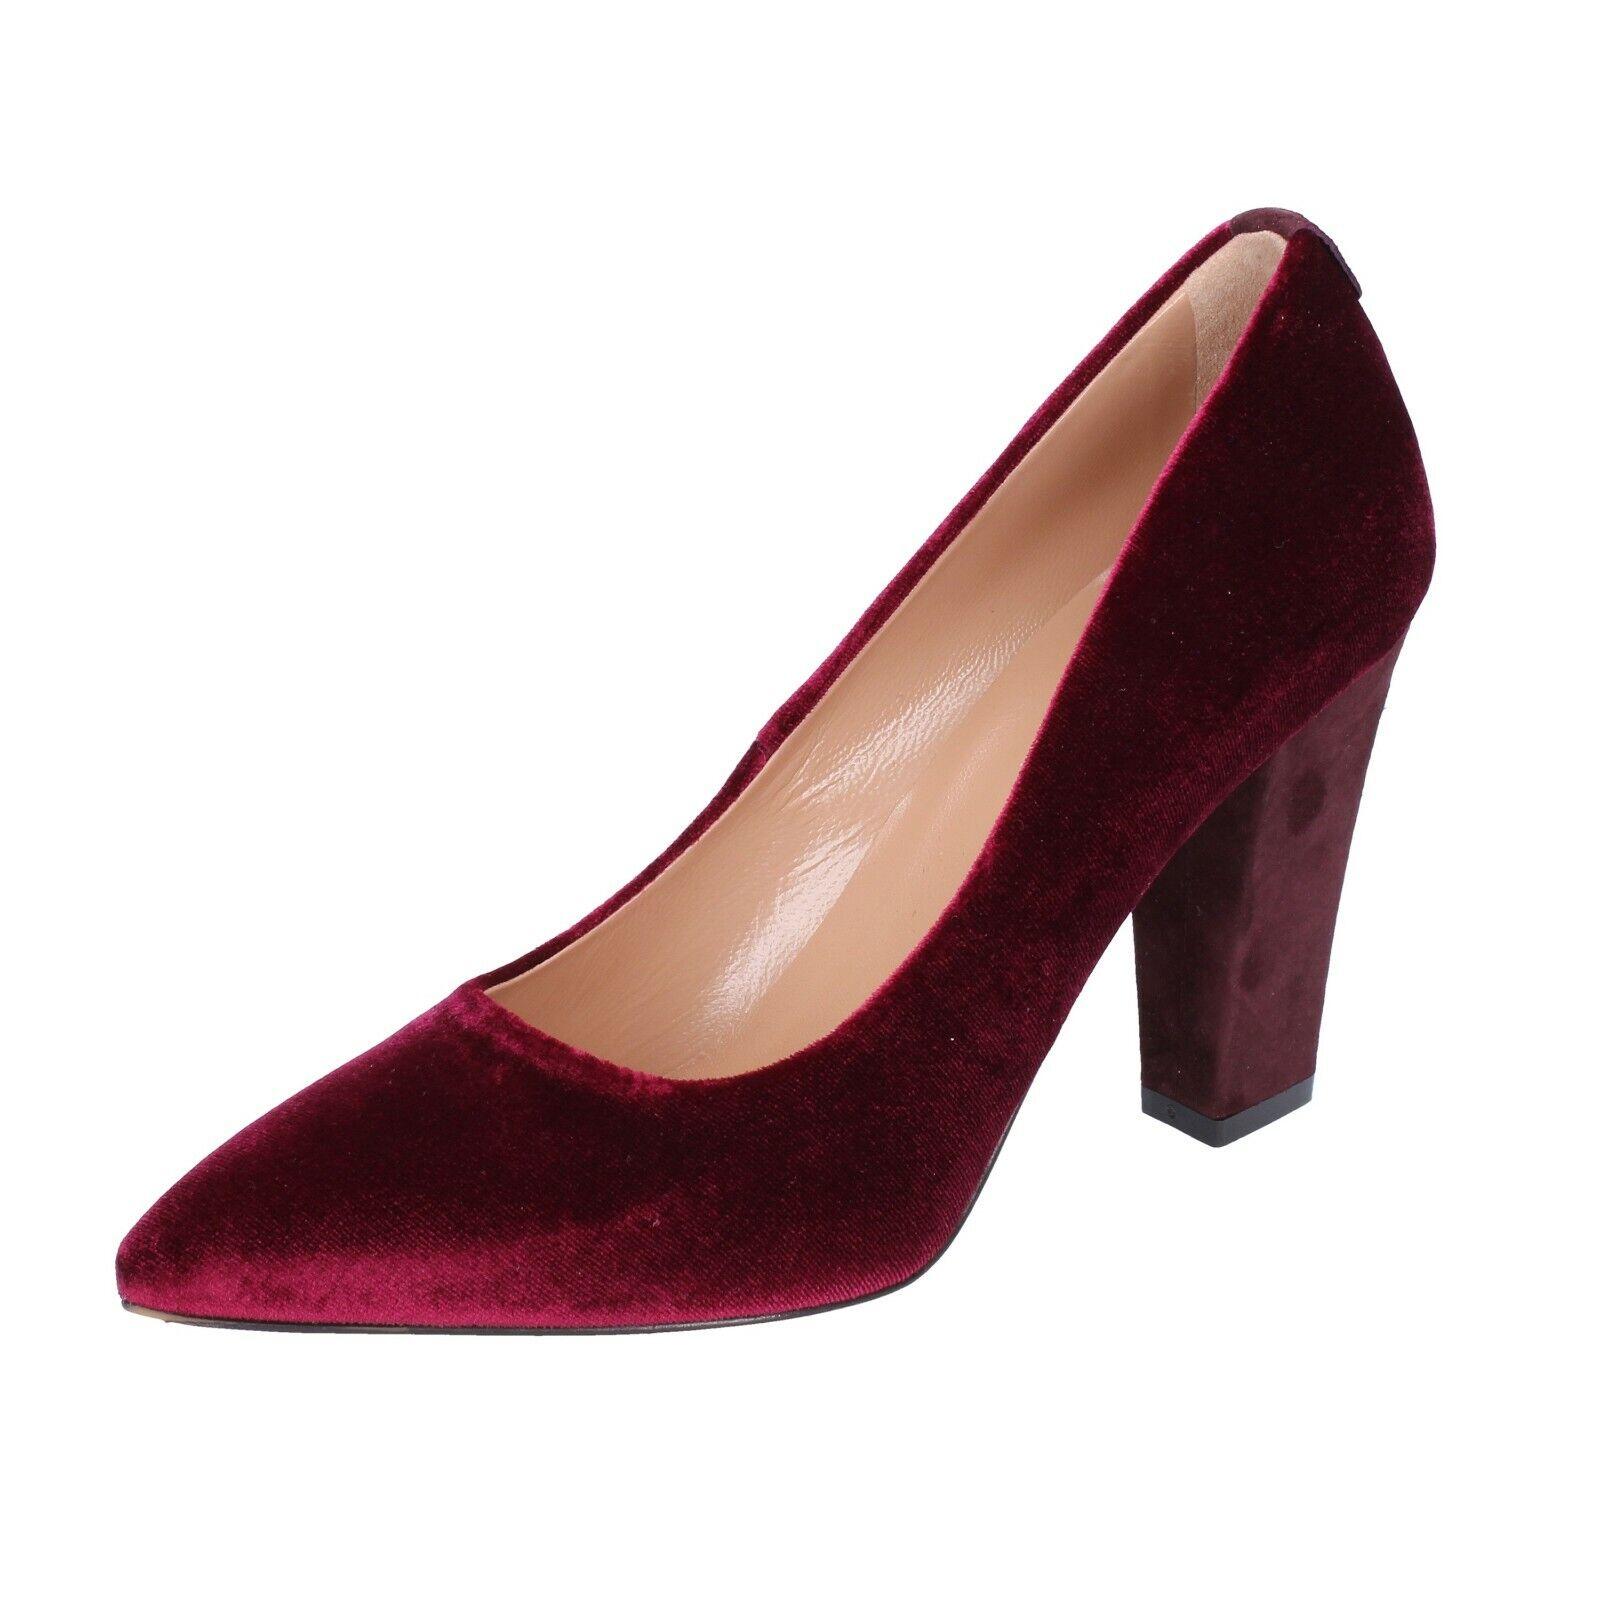 kvinnor skor TWIN -SET 37 37 37 EU Pumpar Burgundy sammet BS258 -37  bekväm